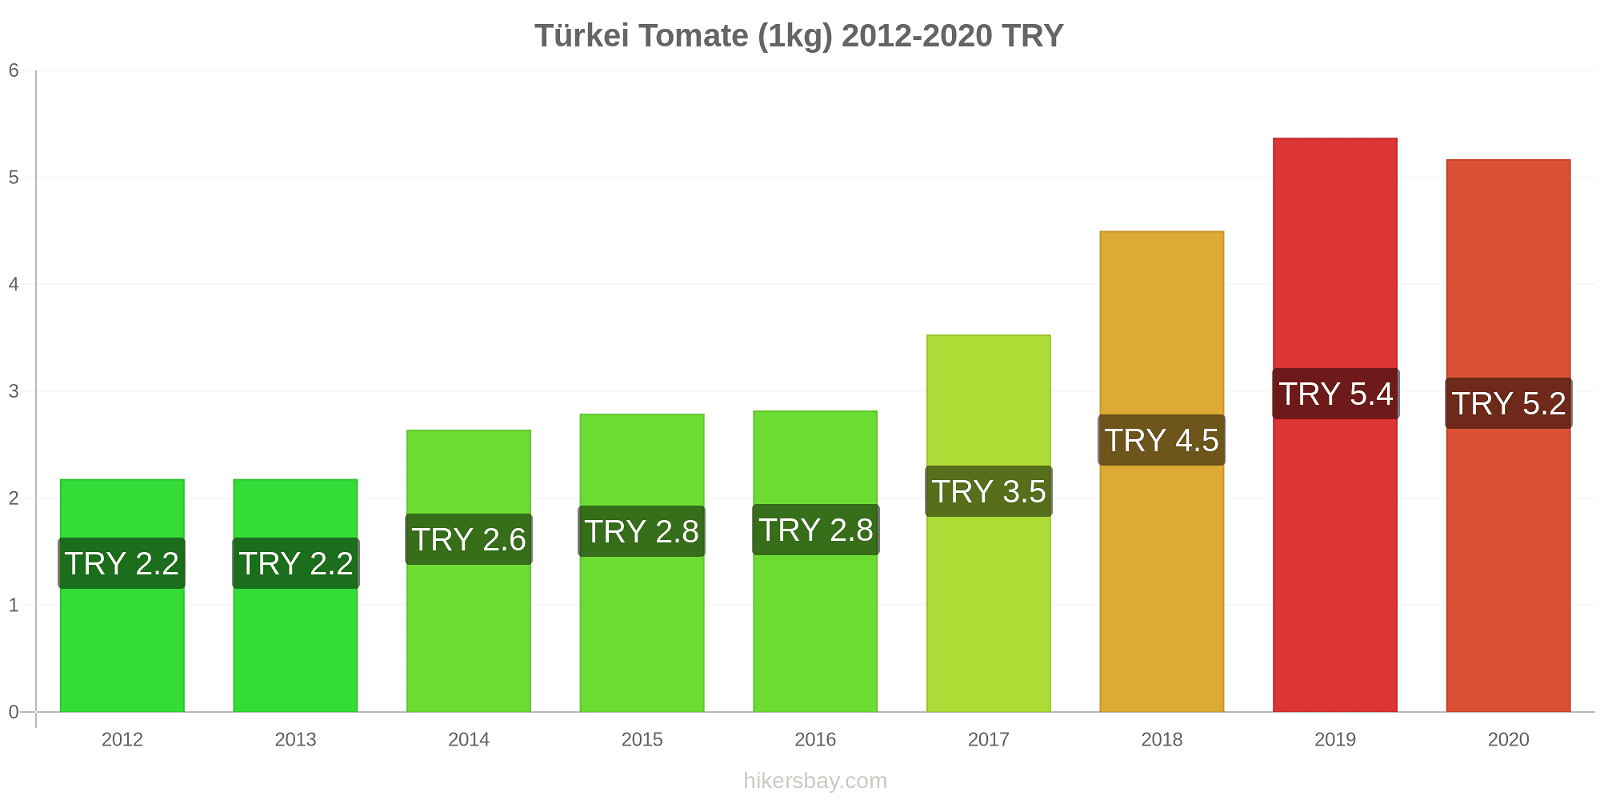 Türkei Preisänderungen Tomaten (1kg) hikersbay.com